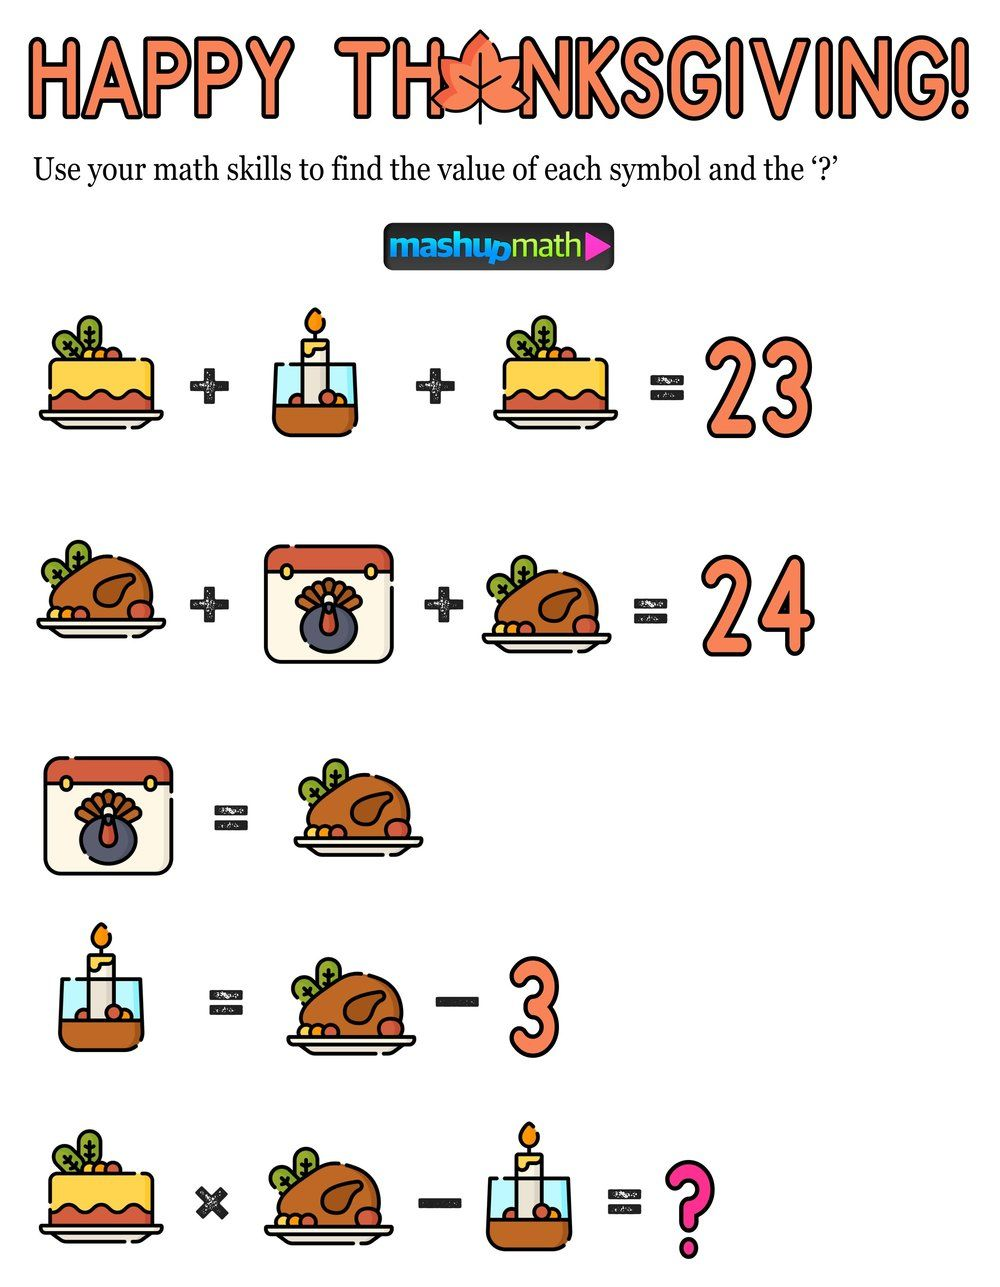 12 Thanksgiving Math Activities For Grades 1 8 Mashup Math Thanksgiving Math Thanksgiving Math Activities Math Activities [ 1287 x 1000 Pixel ]